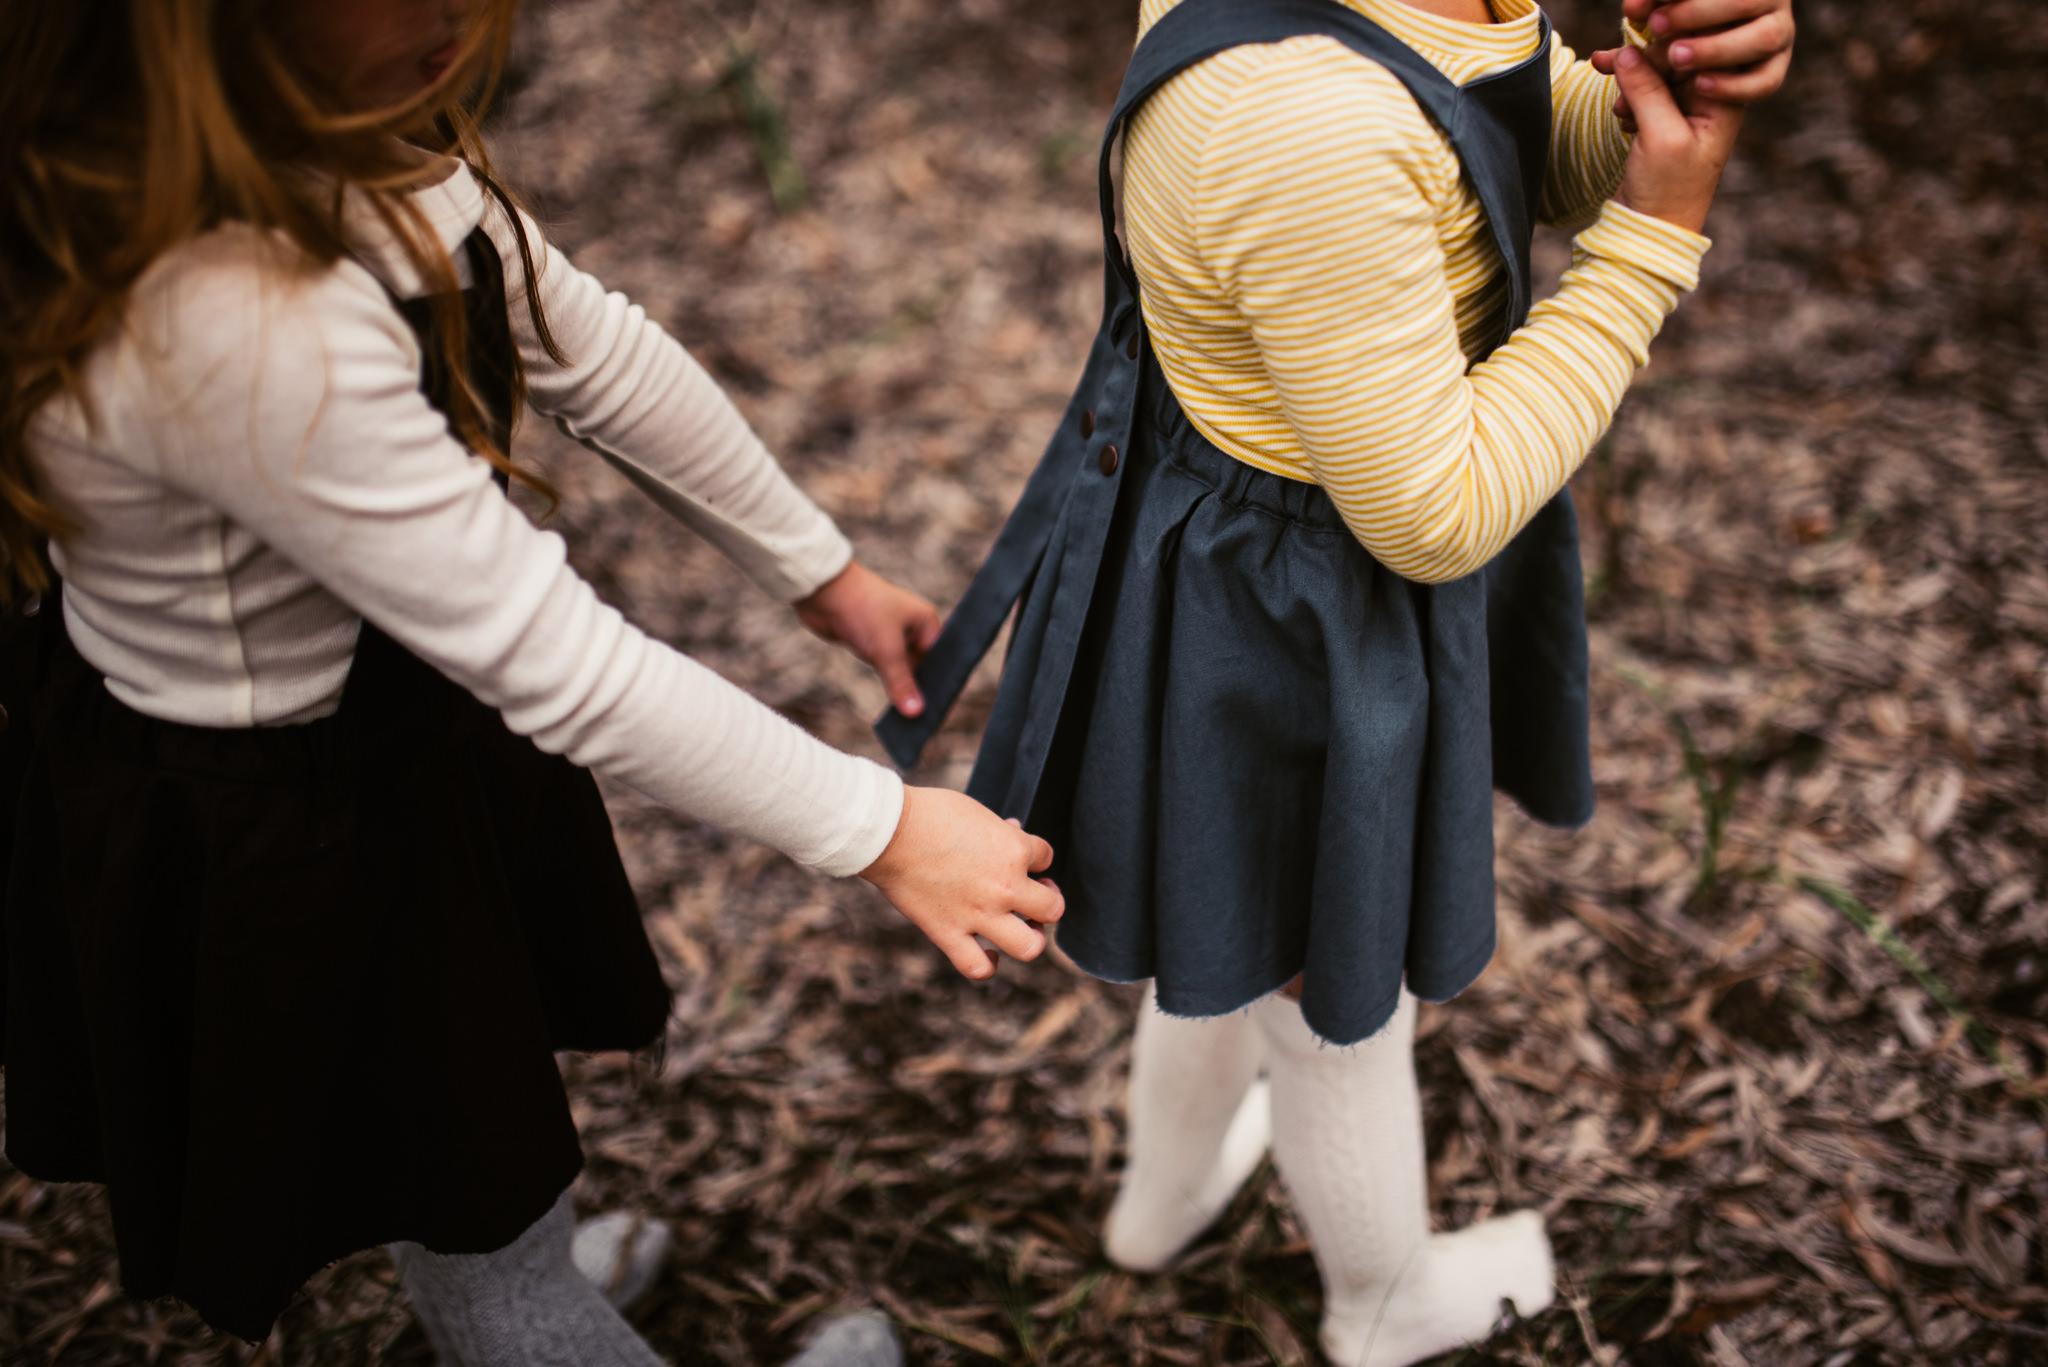 twyla jones photography - treasure coast florida - childrens adventure clothing commercial shoot--22.jpg